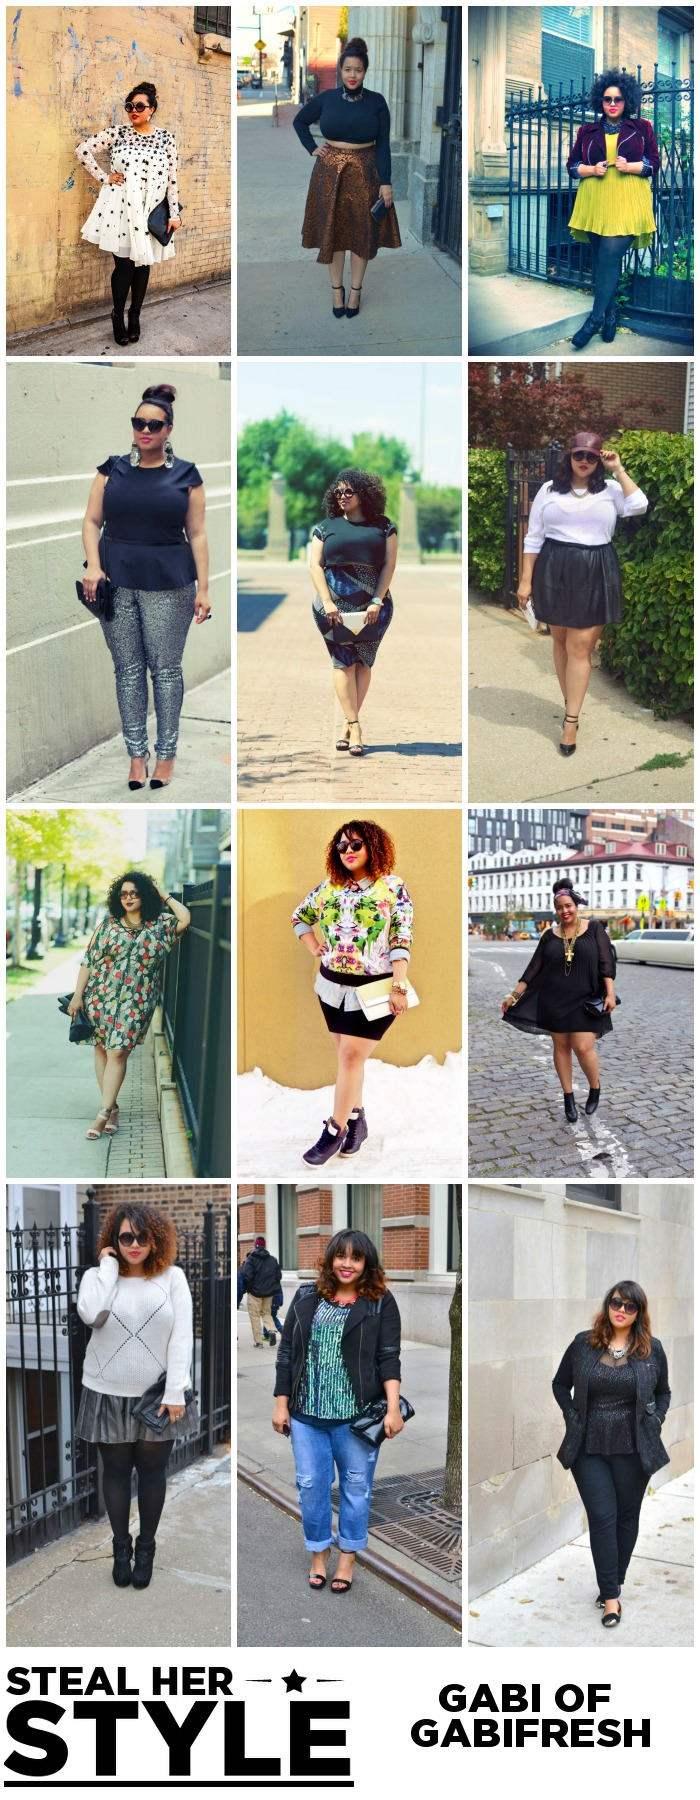 Steal Her Style GabiFresh